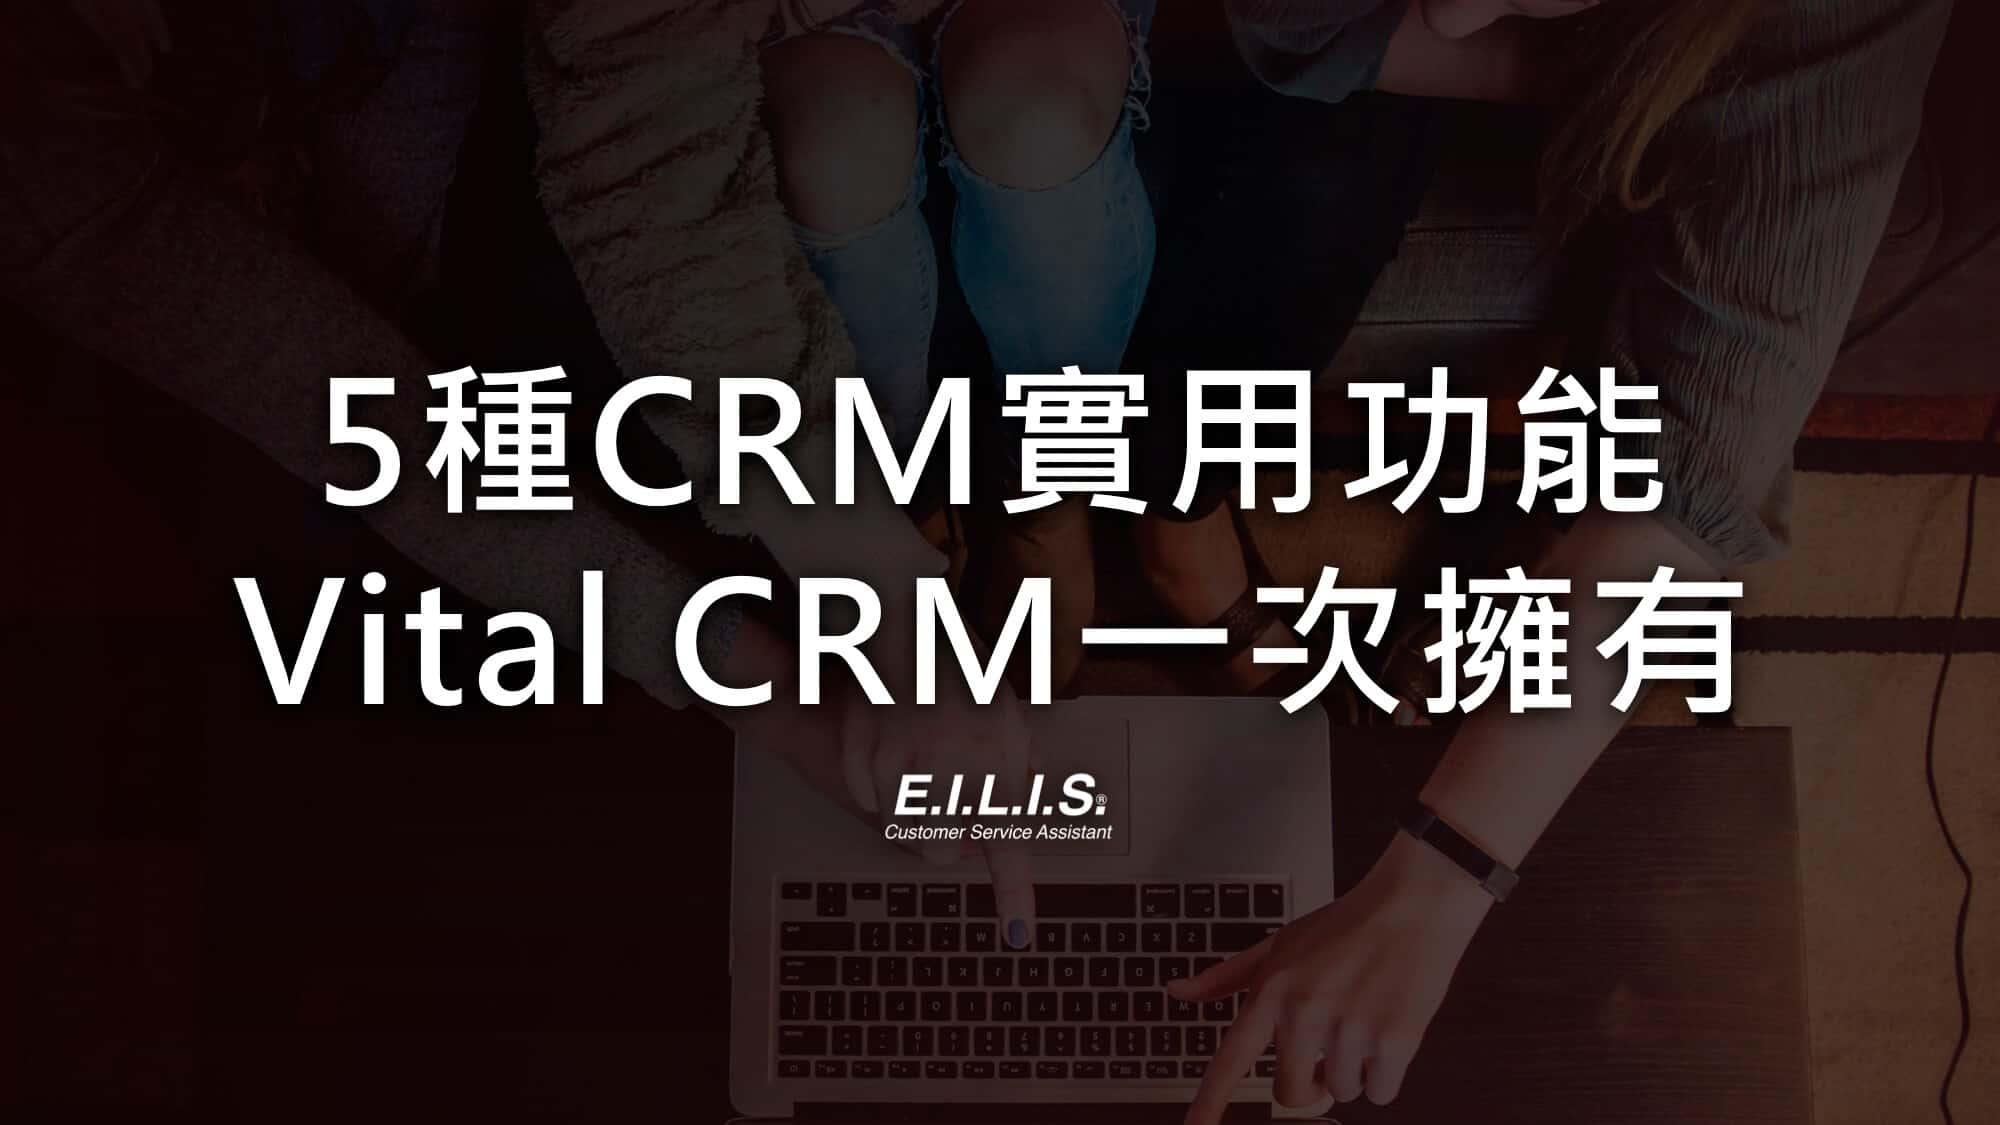 Vital crm|5大實用功能,Vital crm 滿足各種客戶關係管理所需的服務!